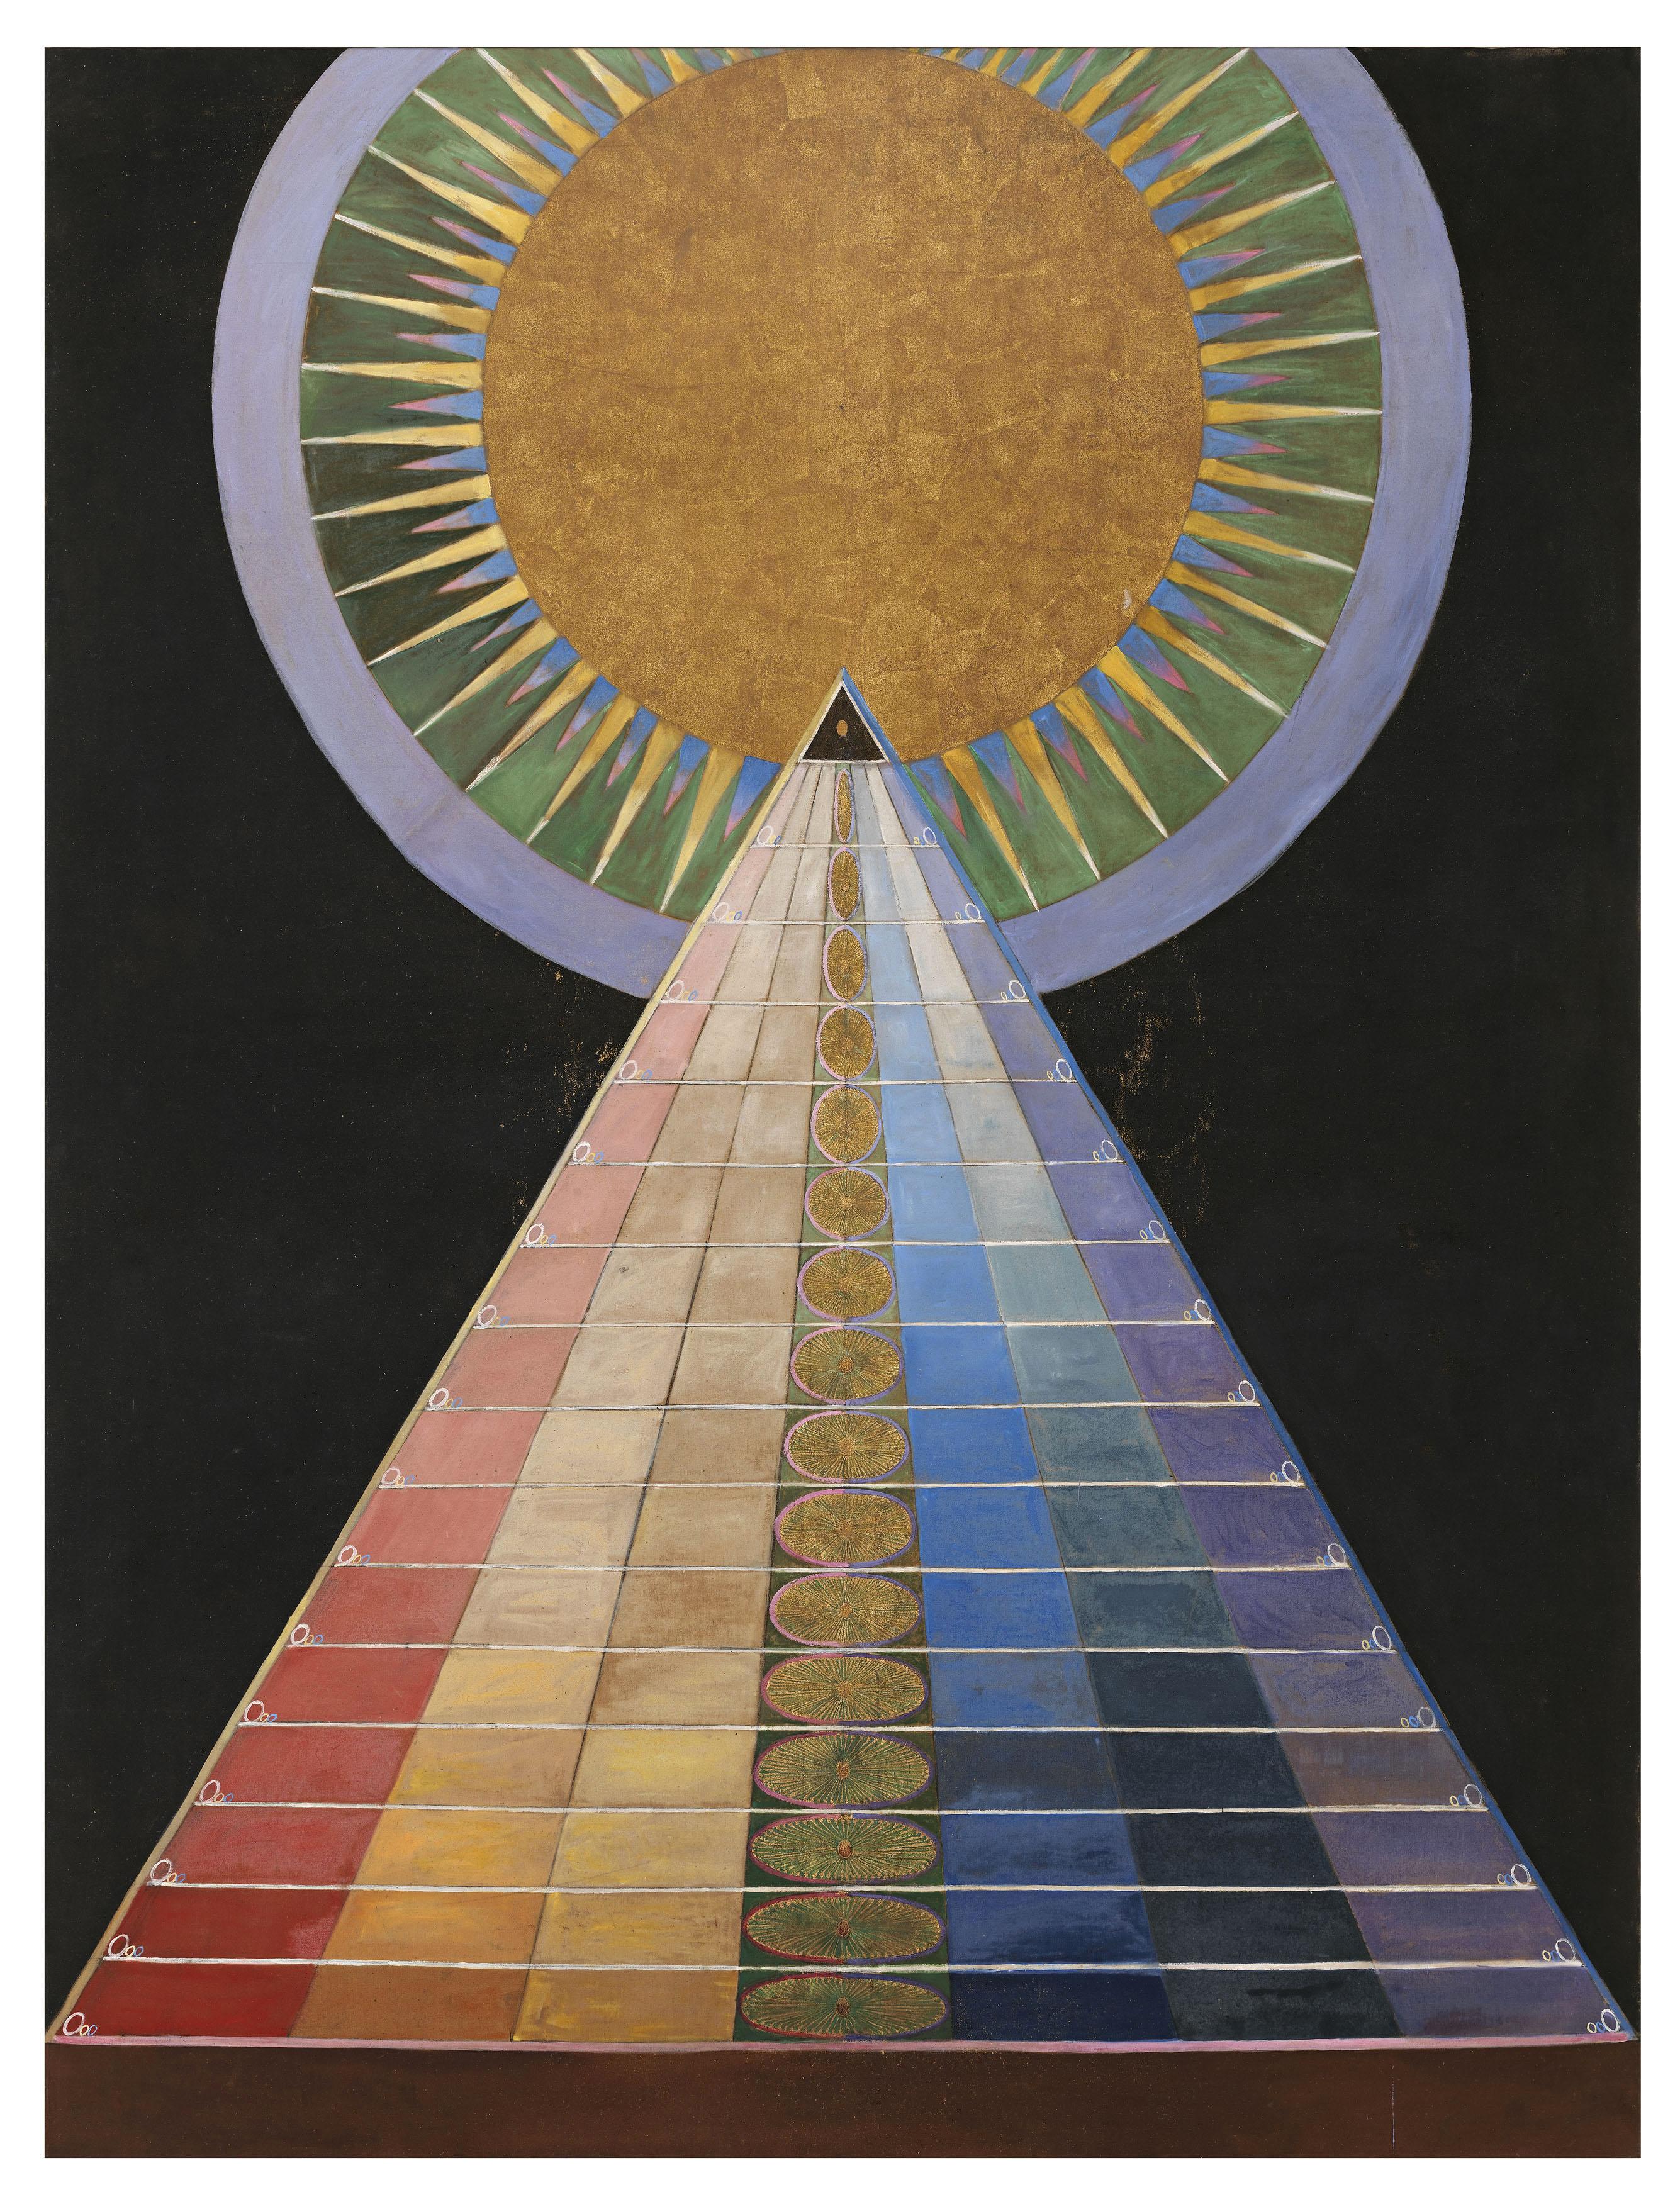 Hilma_af_Klint_-_1907_-_Altarpiece_-_No_1_-_Group_X_-_Altarpieces